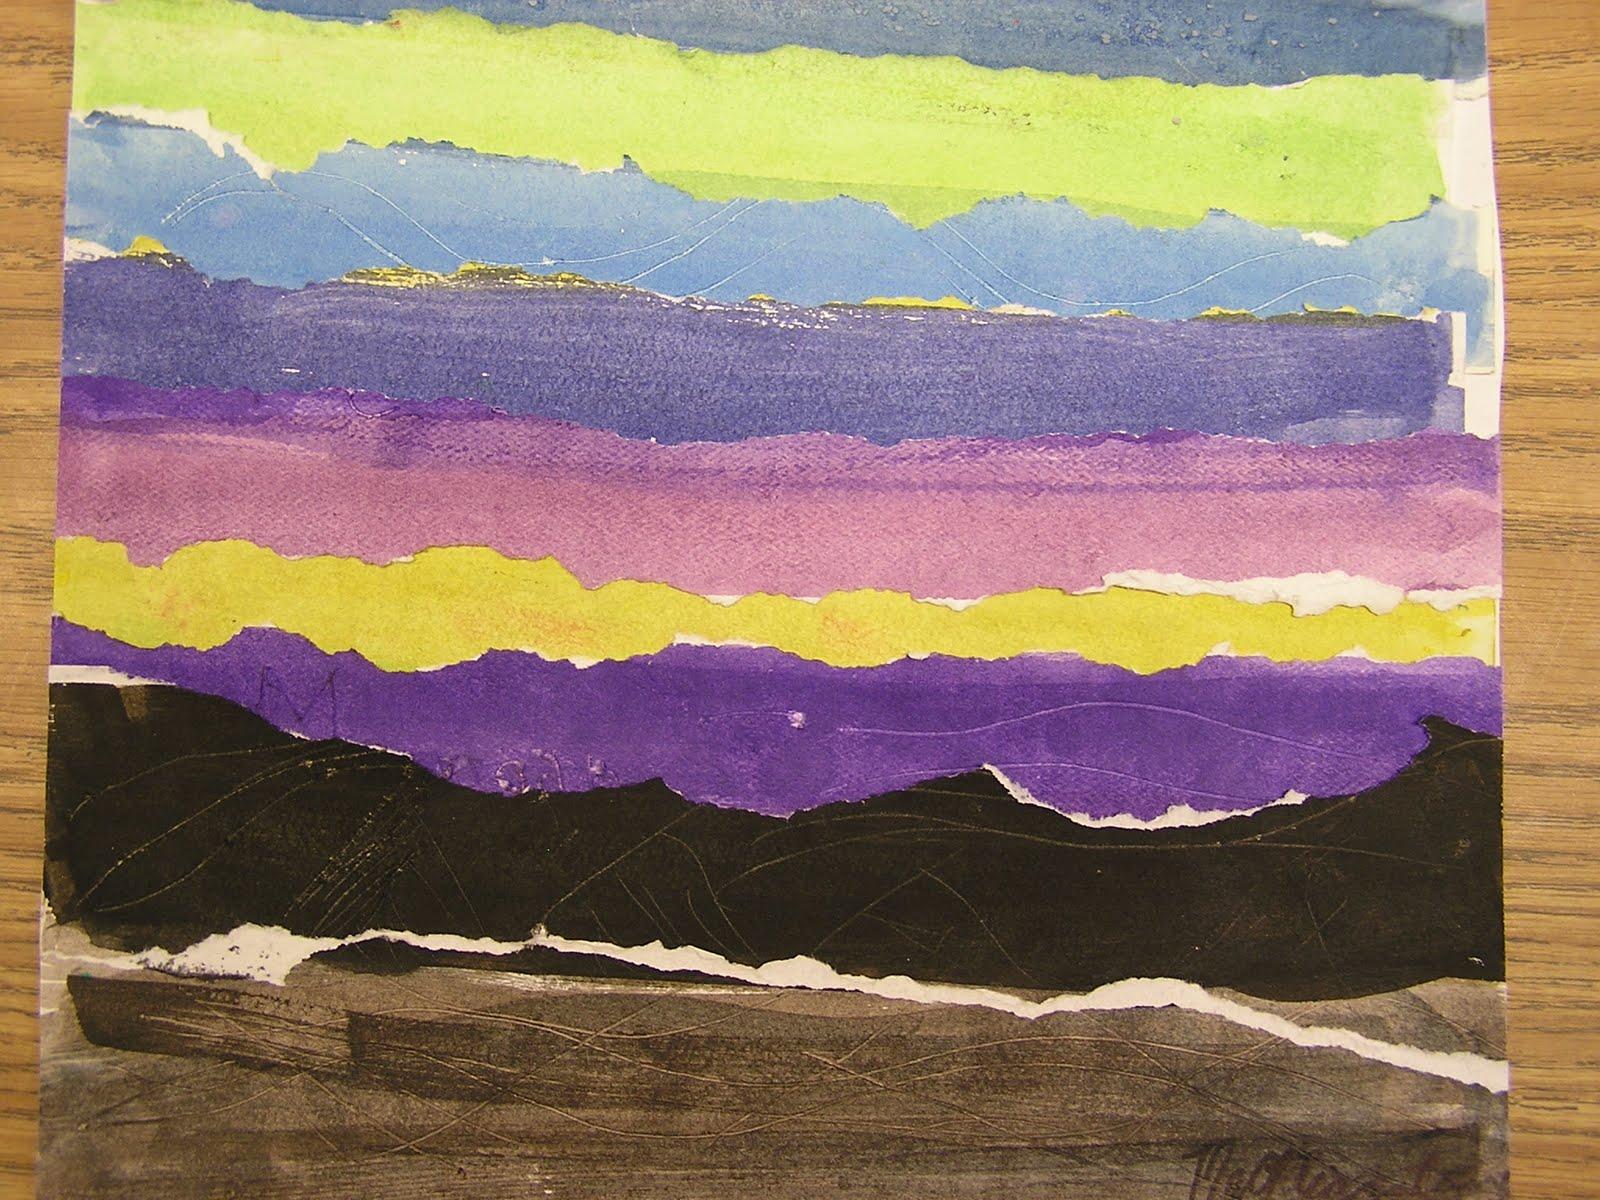 P c k art room sixth grade watercolor landscape collage for Different watercolor techniques